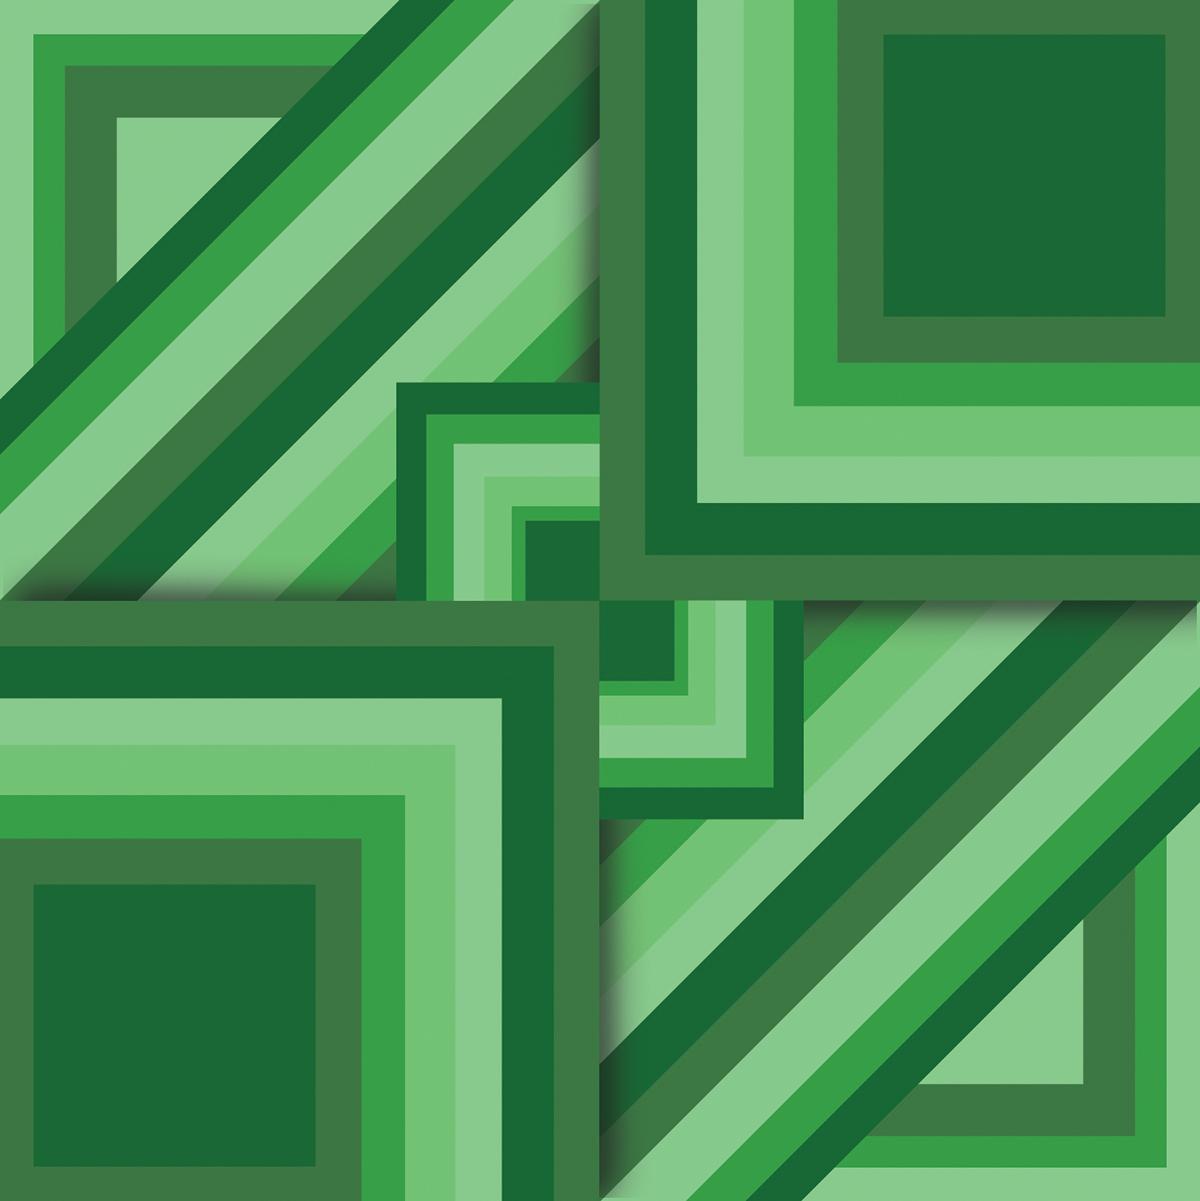 Pattern explore 01